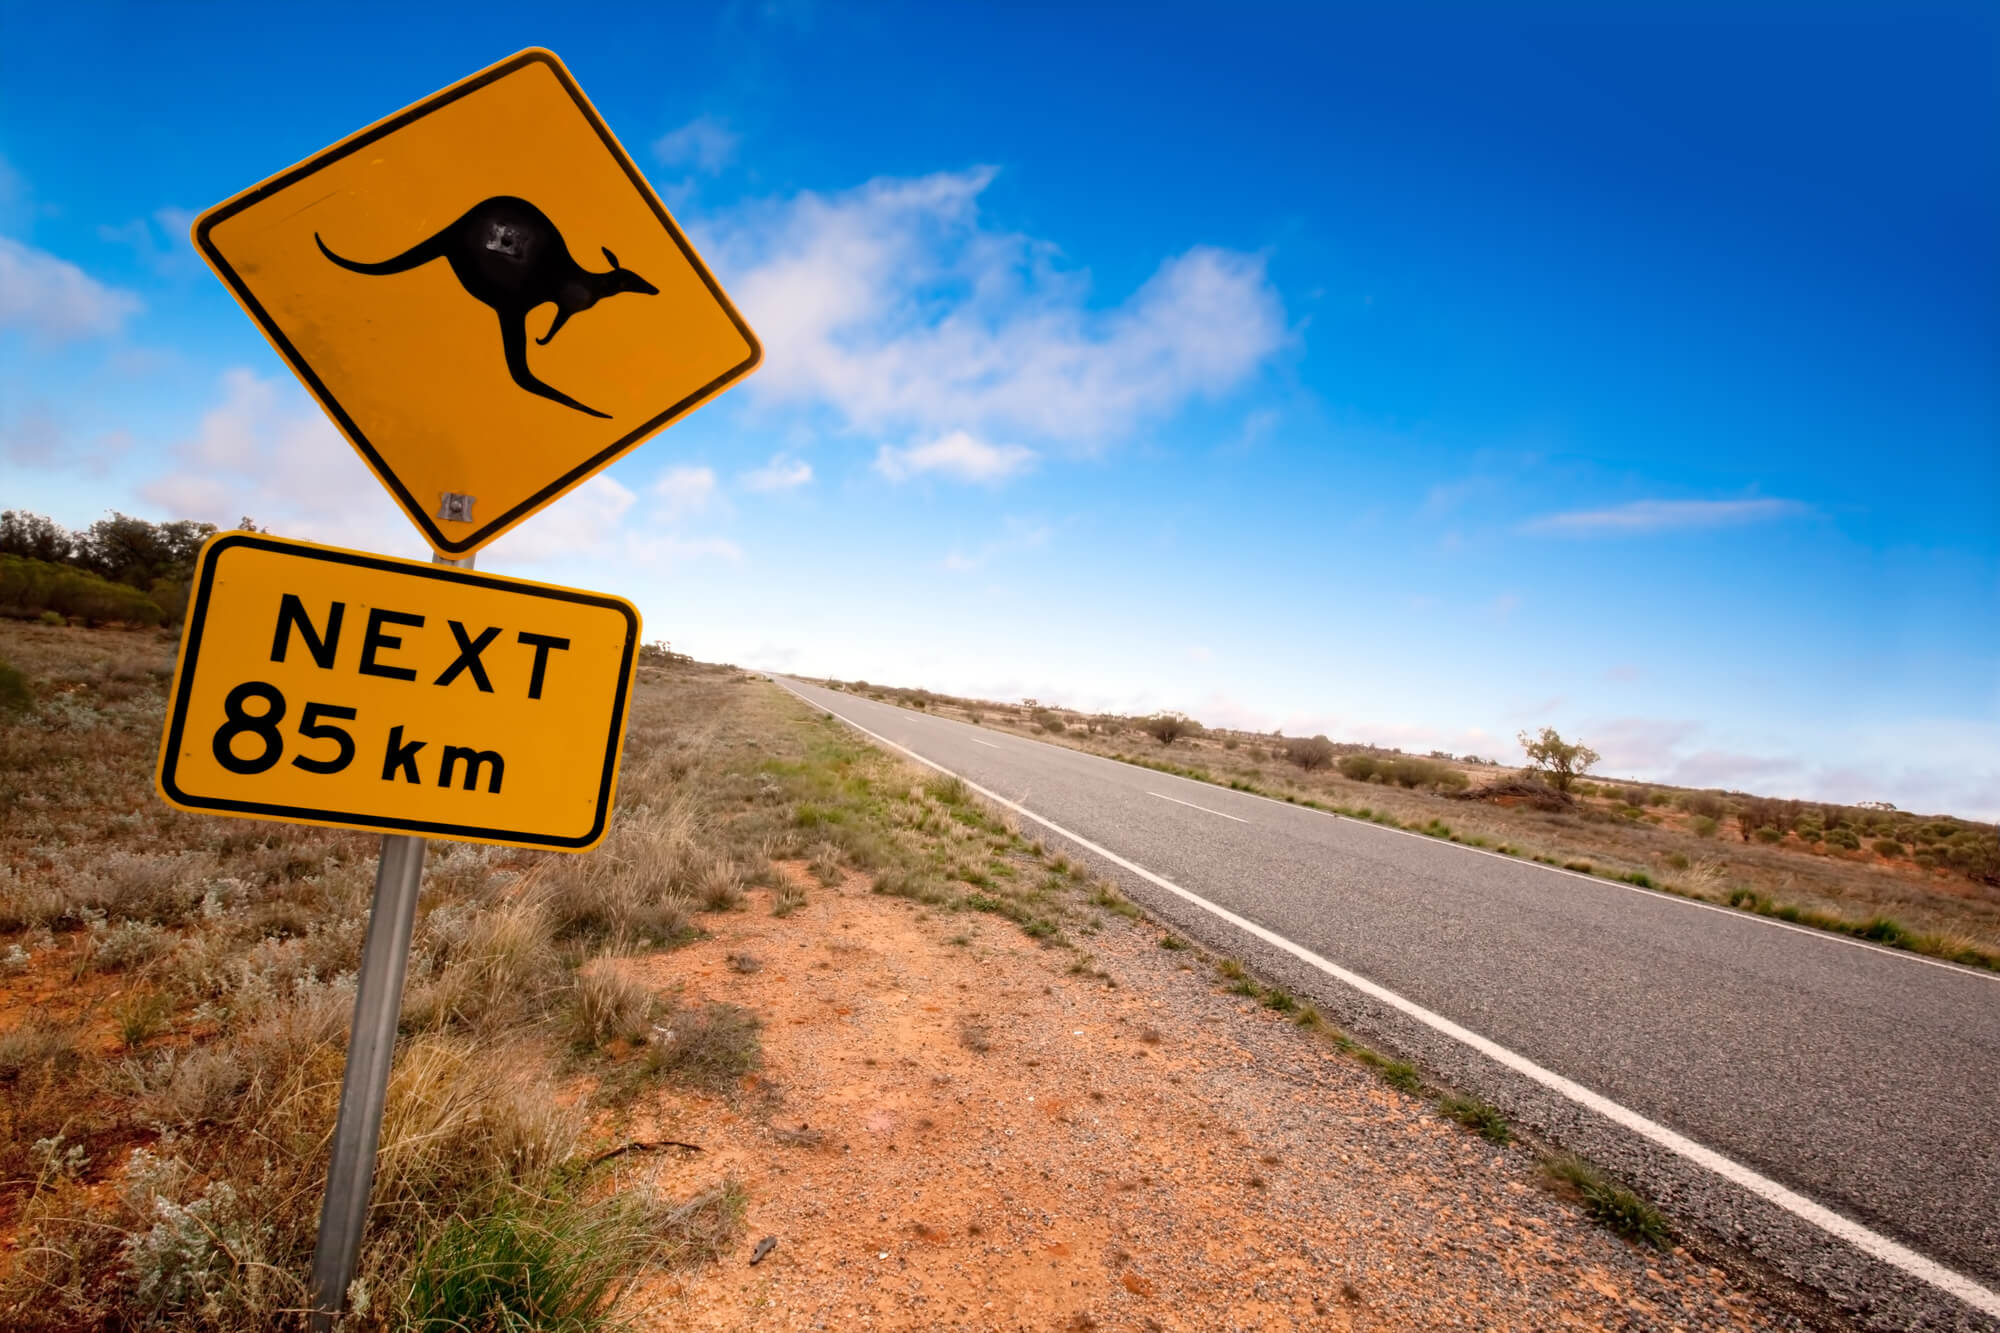 Kangaroo Australia outback sign